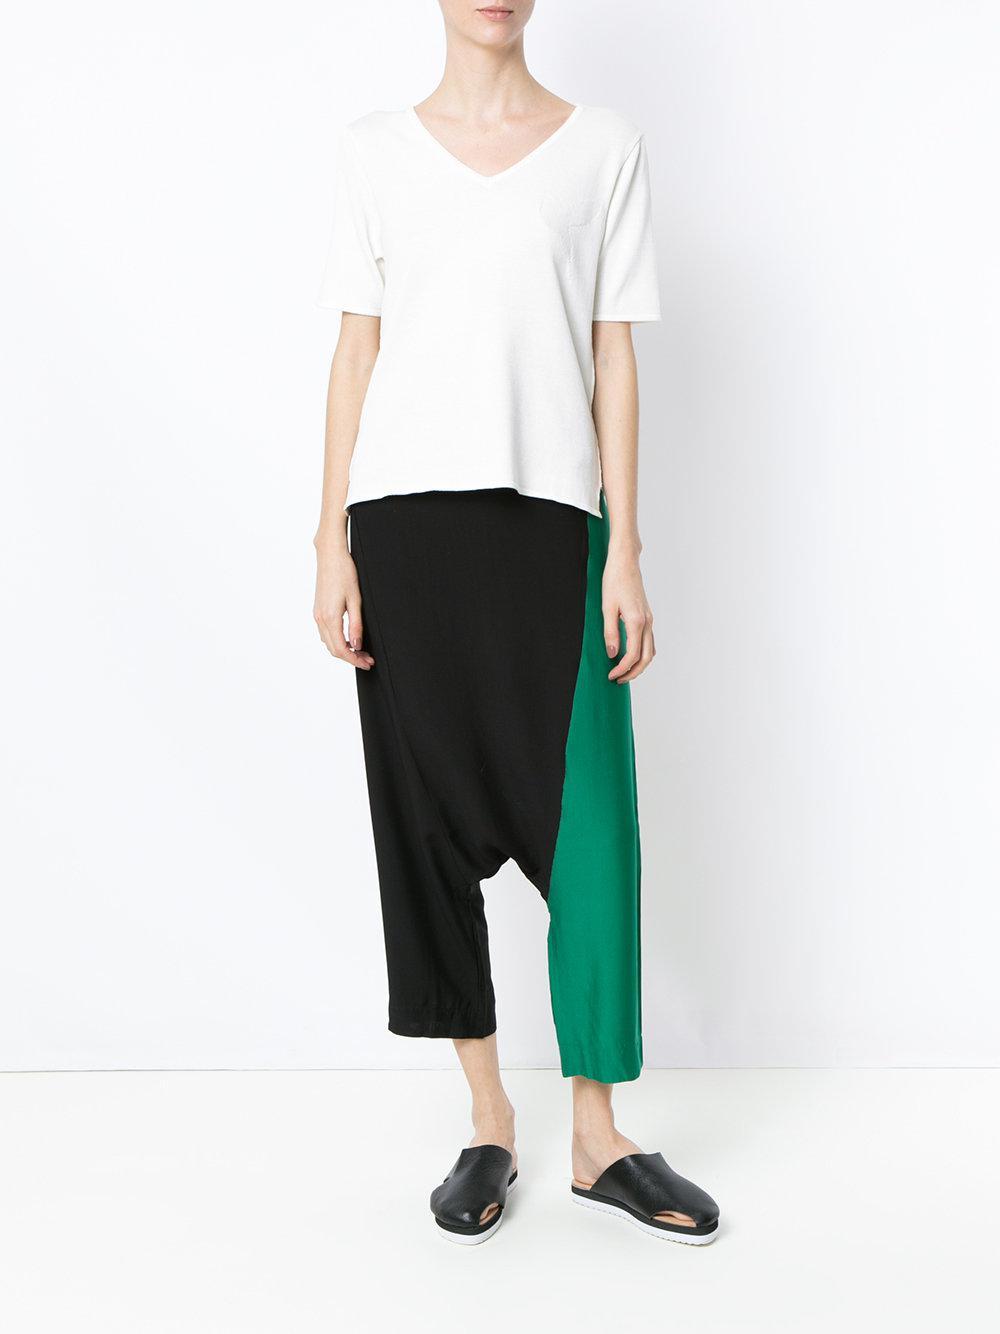 knit T-shirt - White Mara Mac For Sale Clearance Store Cheap Online FsOmohJEq